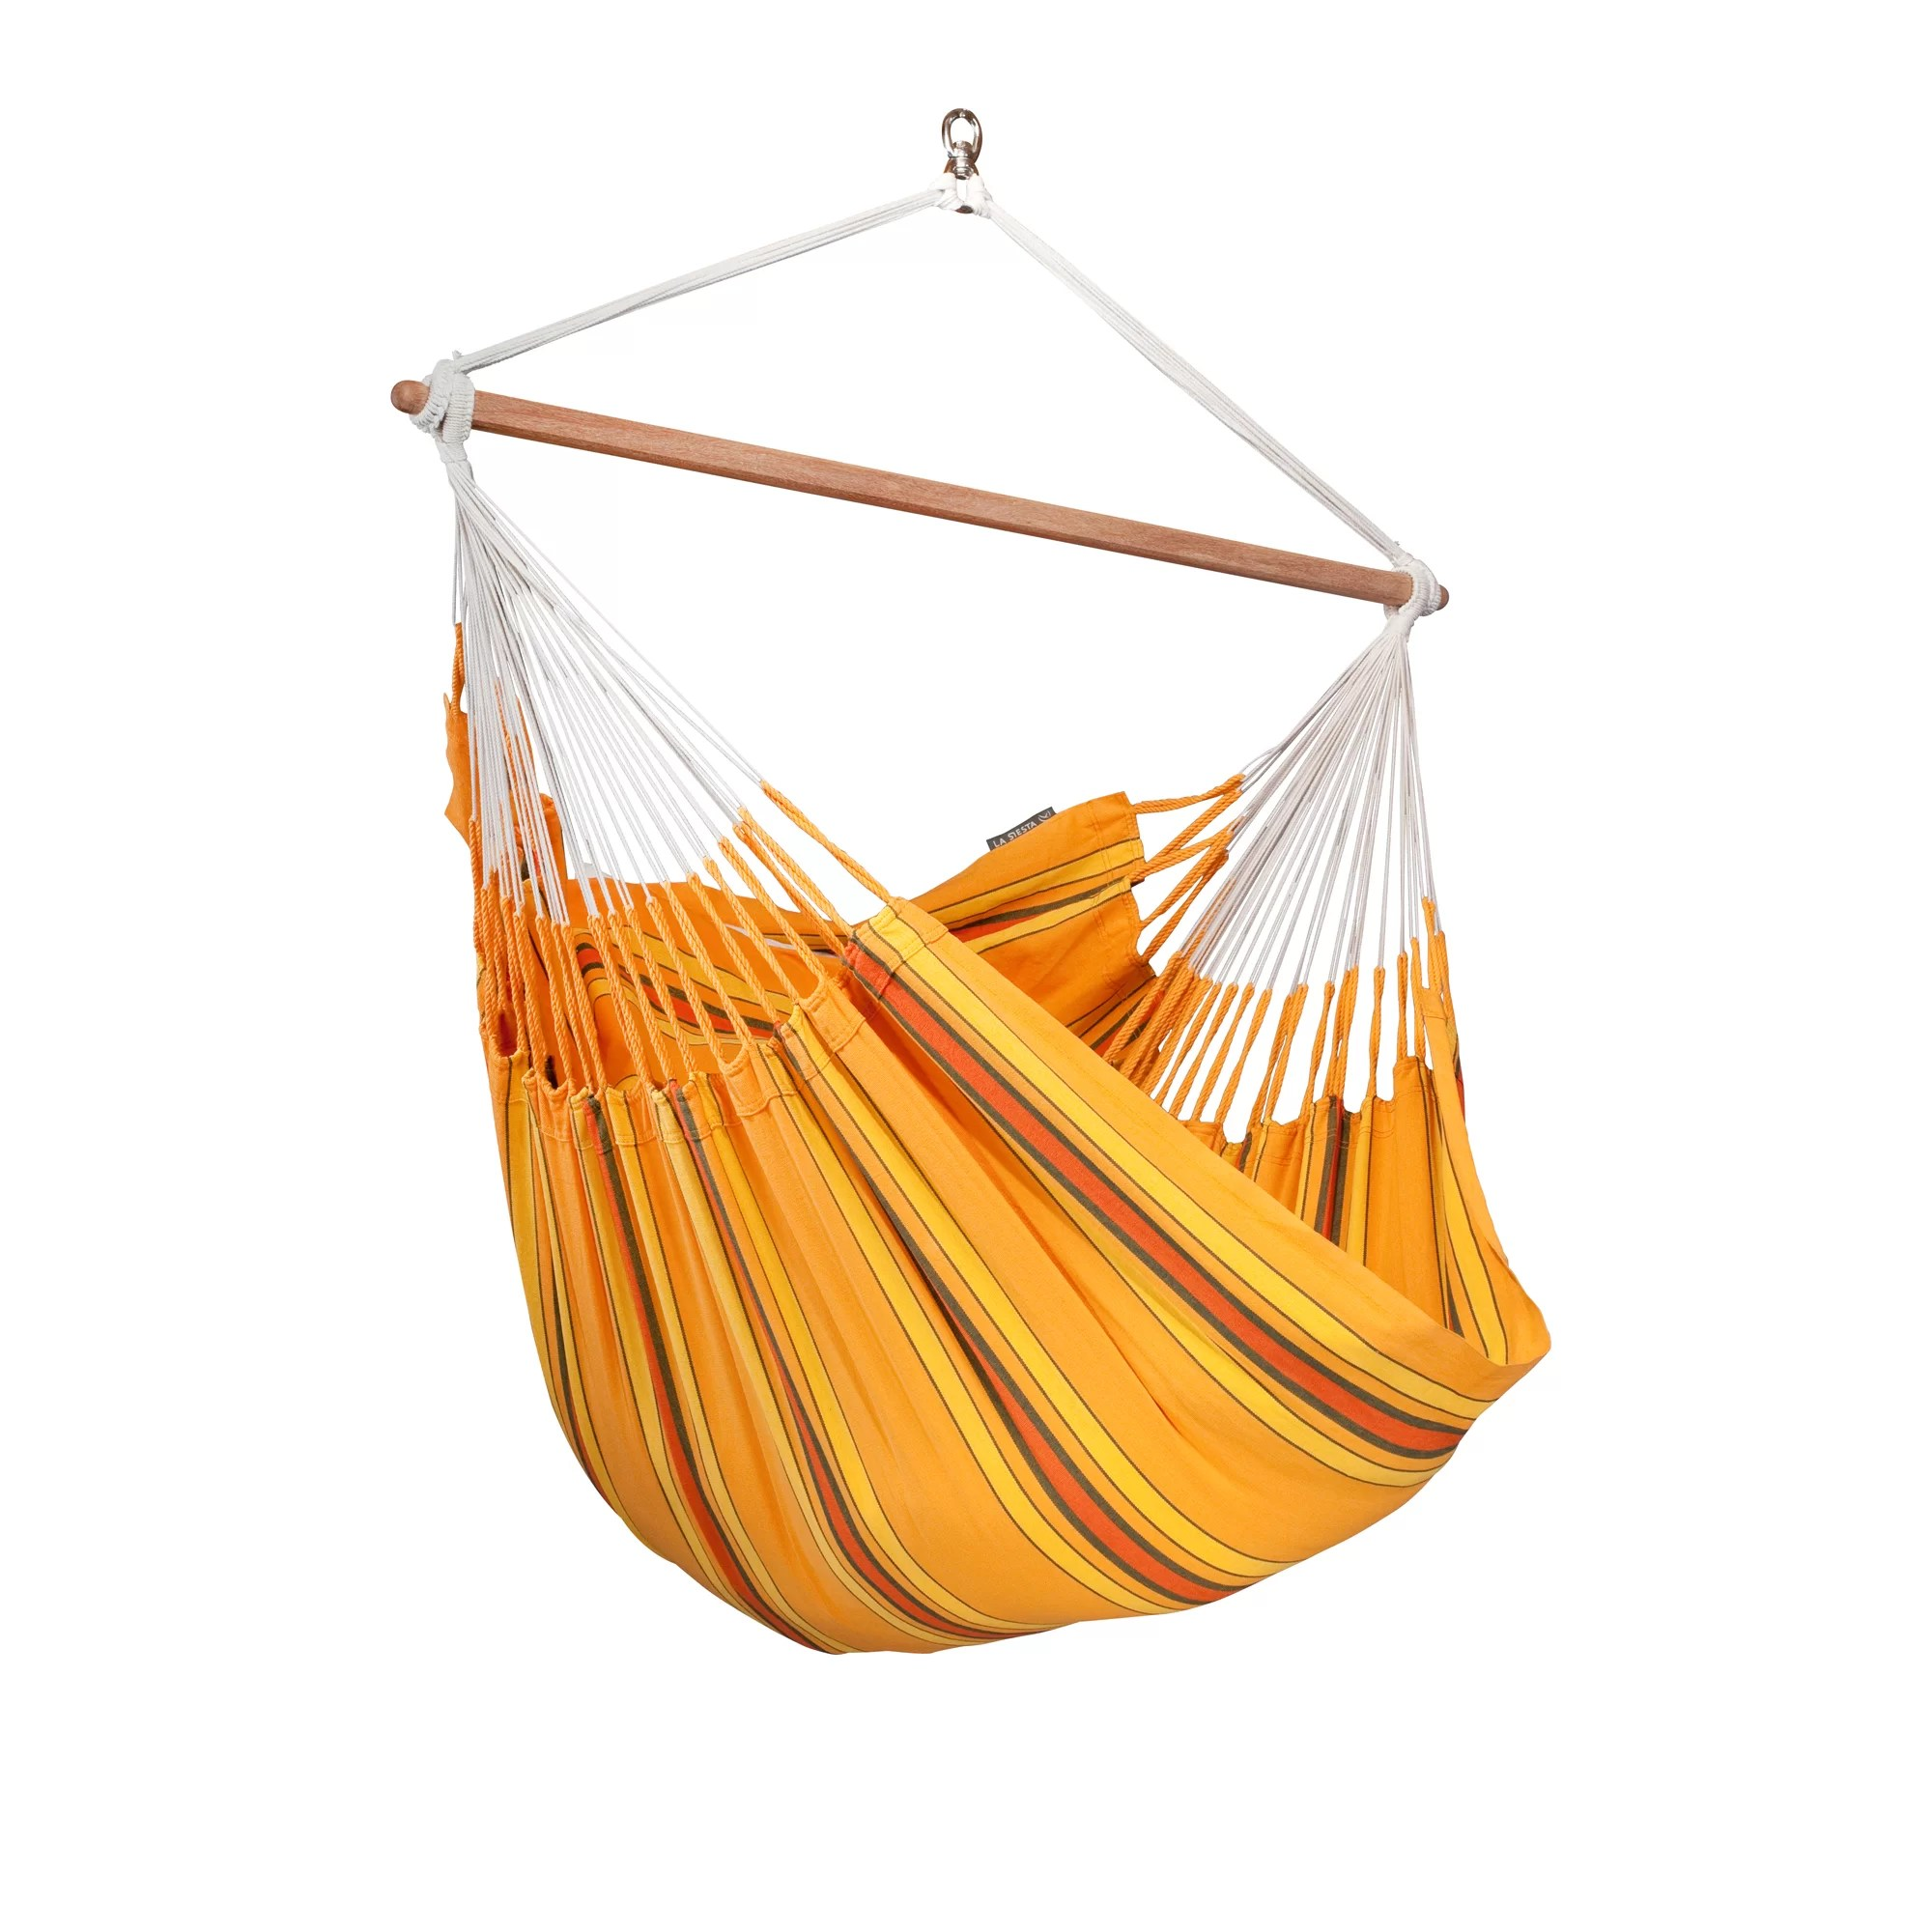 la siesta hammock chair wood chairs currambera lounger and reviews wayfair